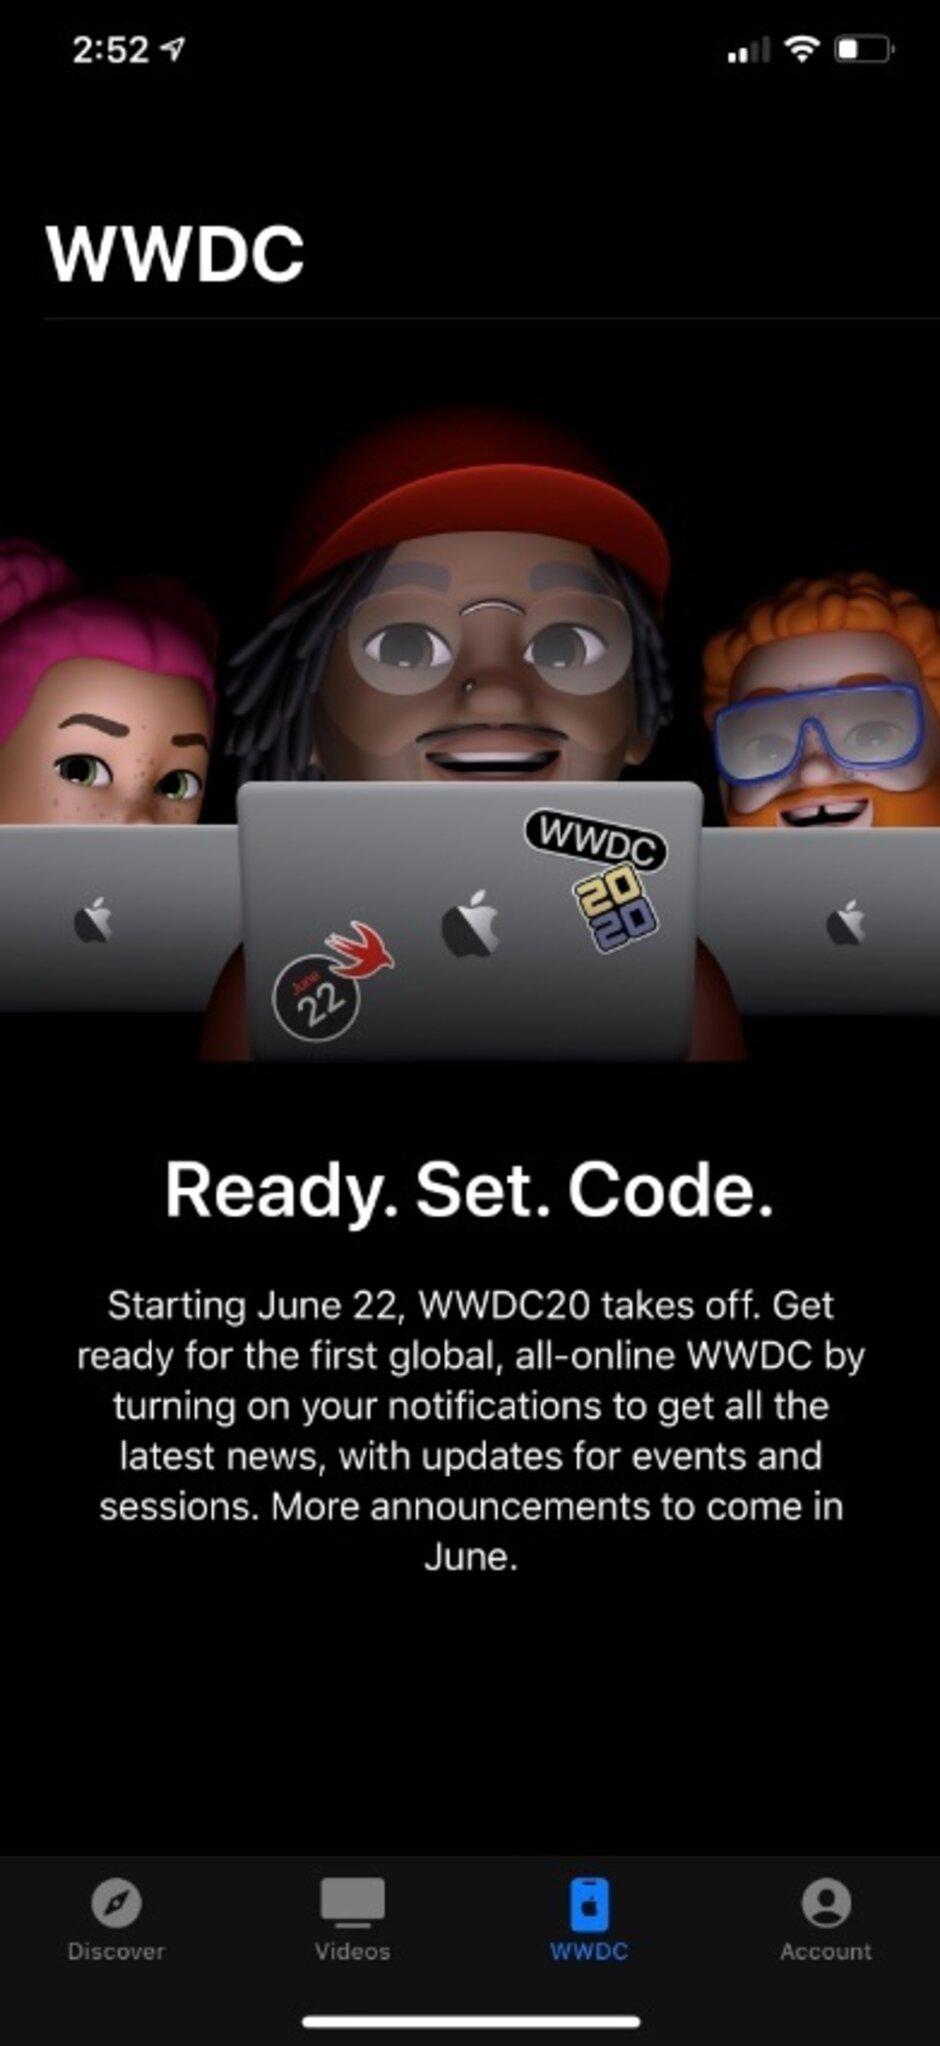 iOS 14和iPadOS 14的早期版本揭示了iPhone,iPad的新功能